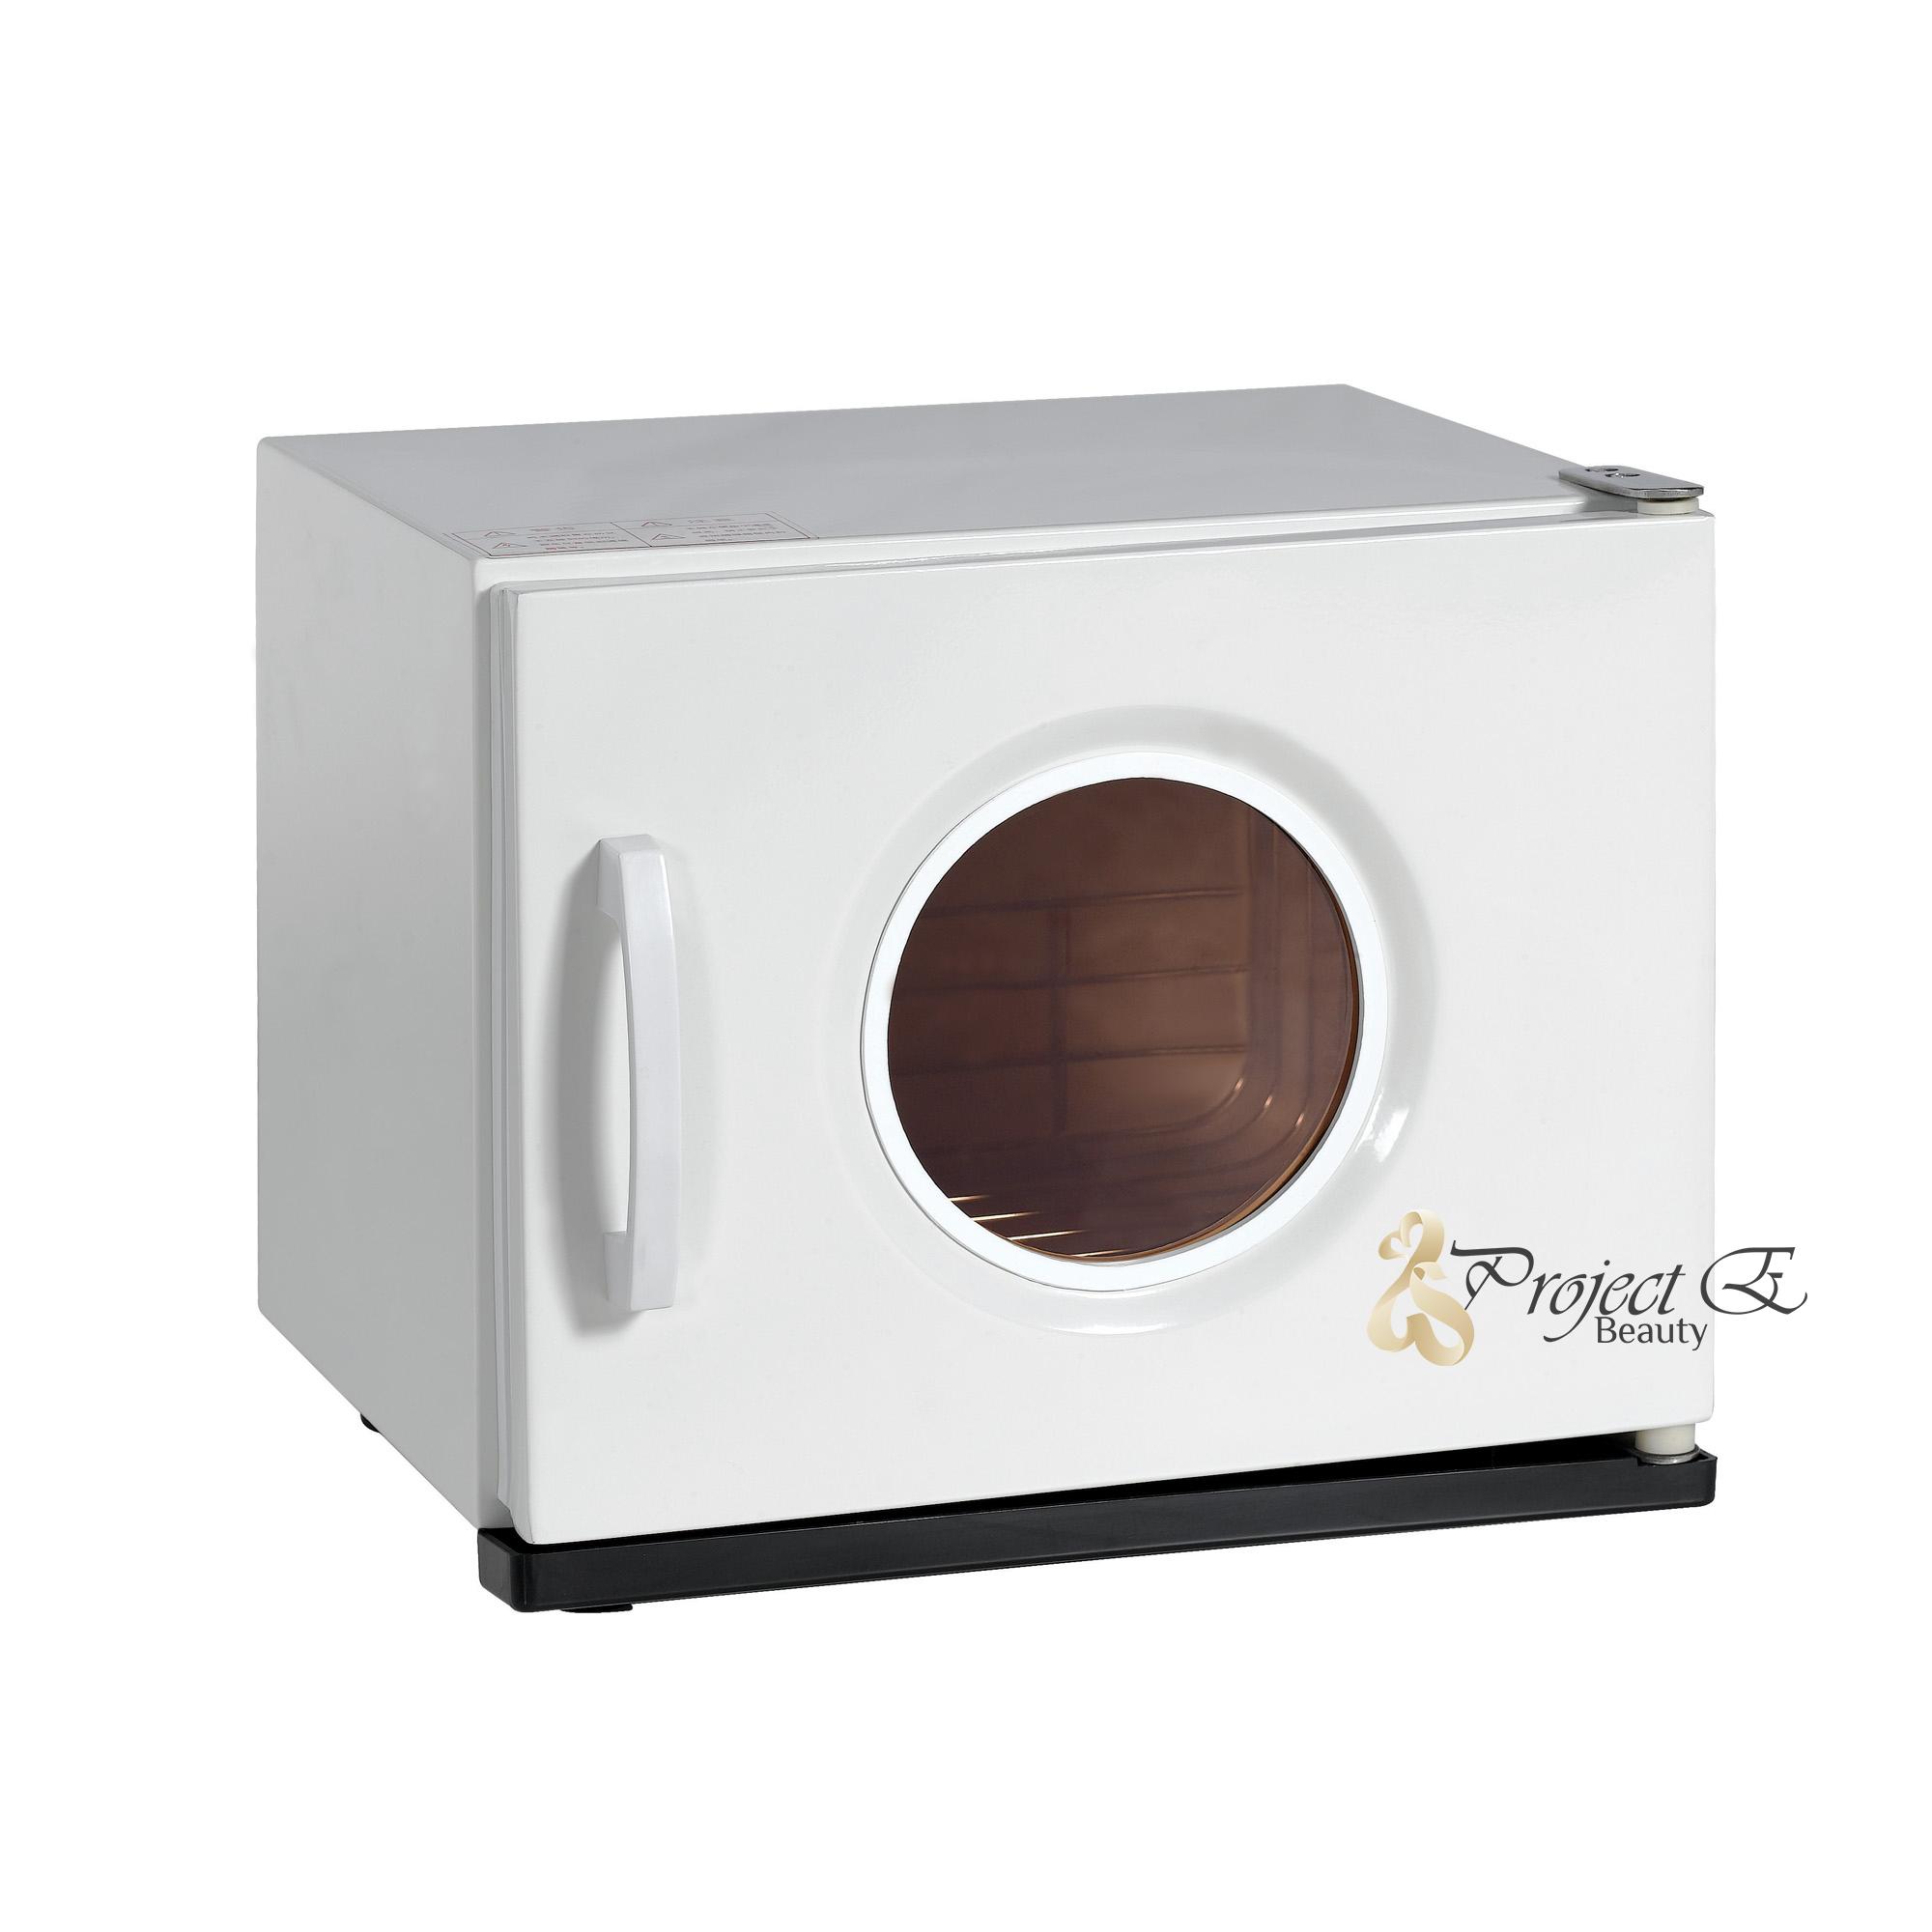 Hot UV Towel Sanitizer Sterilizing Heating Cabinet Warmer Sterilizer Heater Beauty Salon Spa Machine